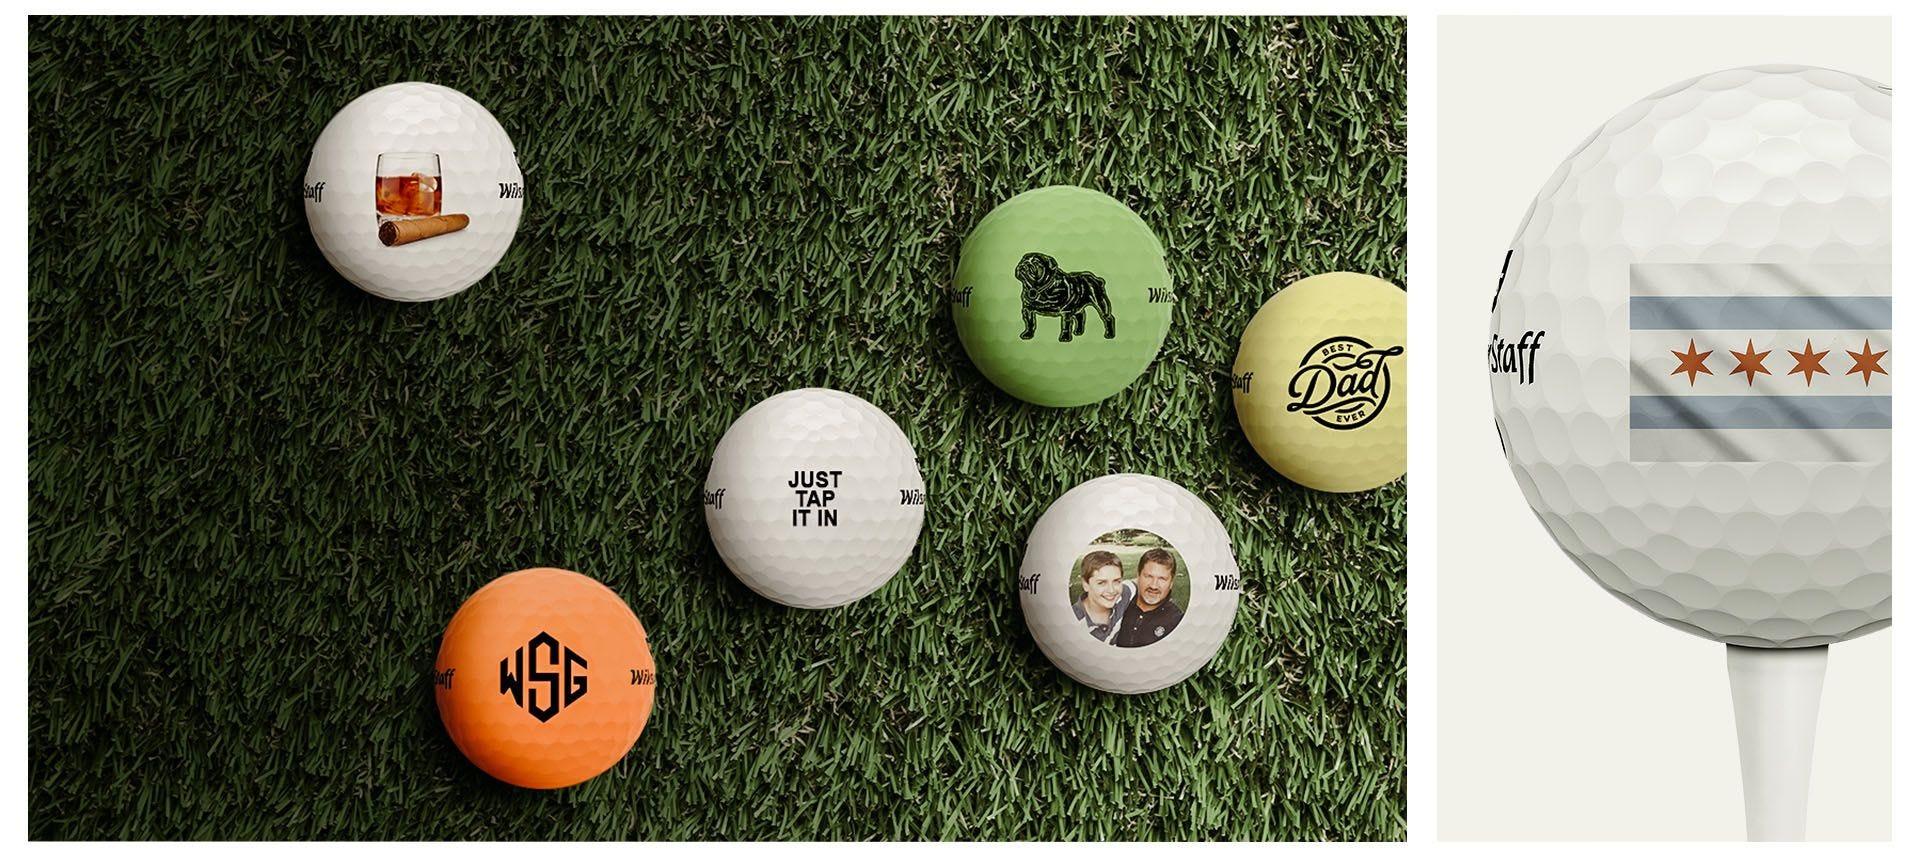 DUO Golf balls with custom logo upload graphics